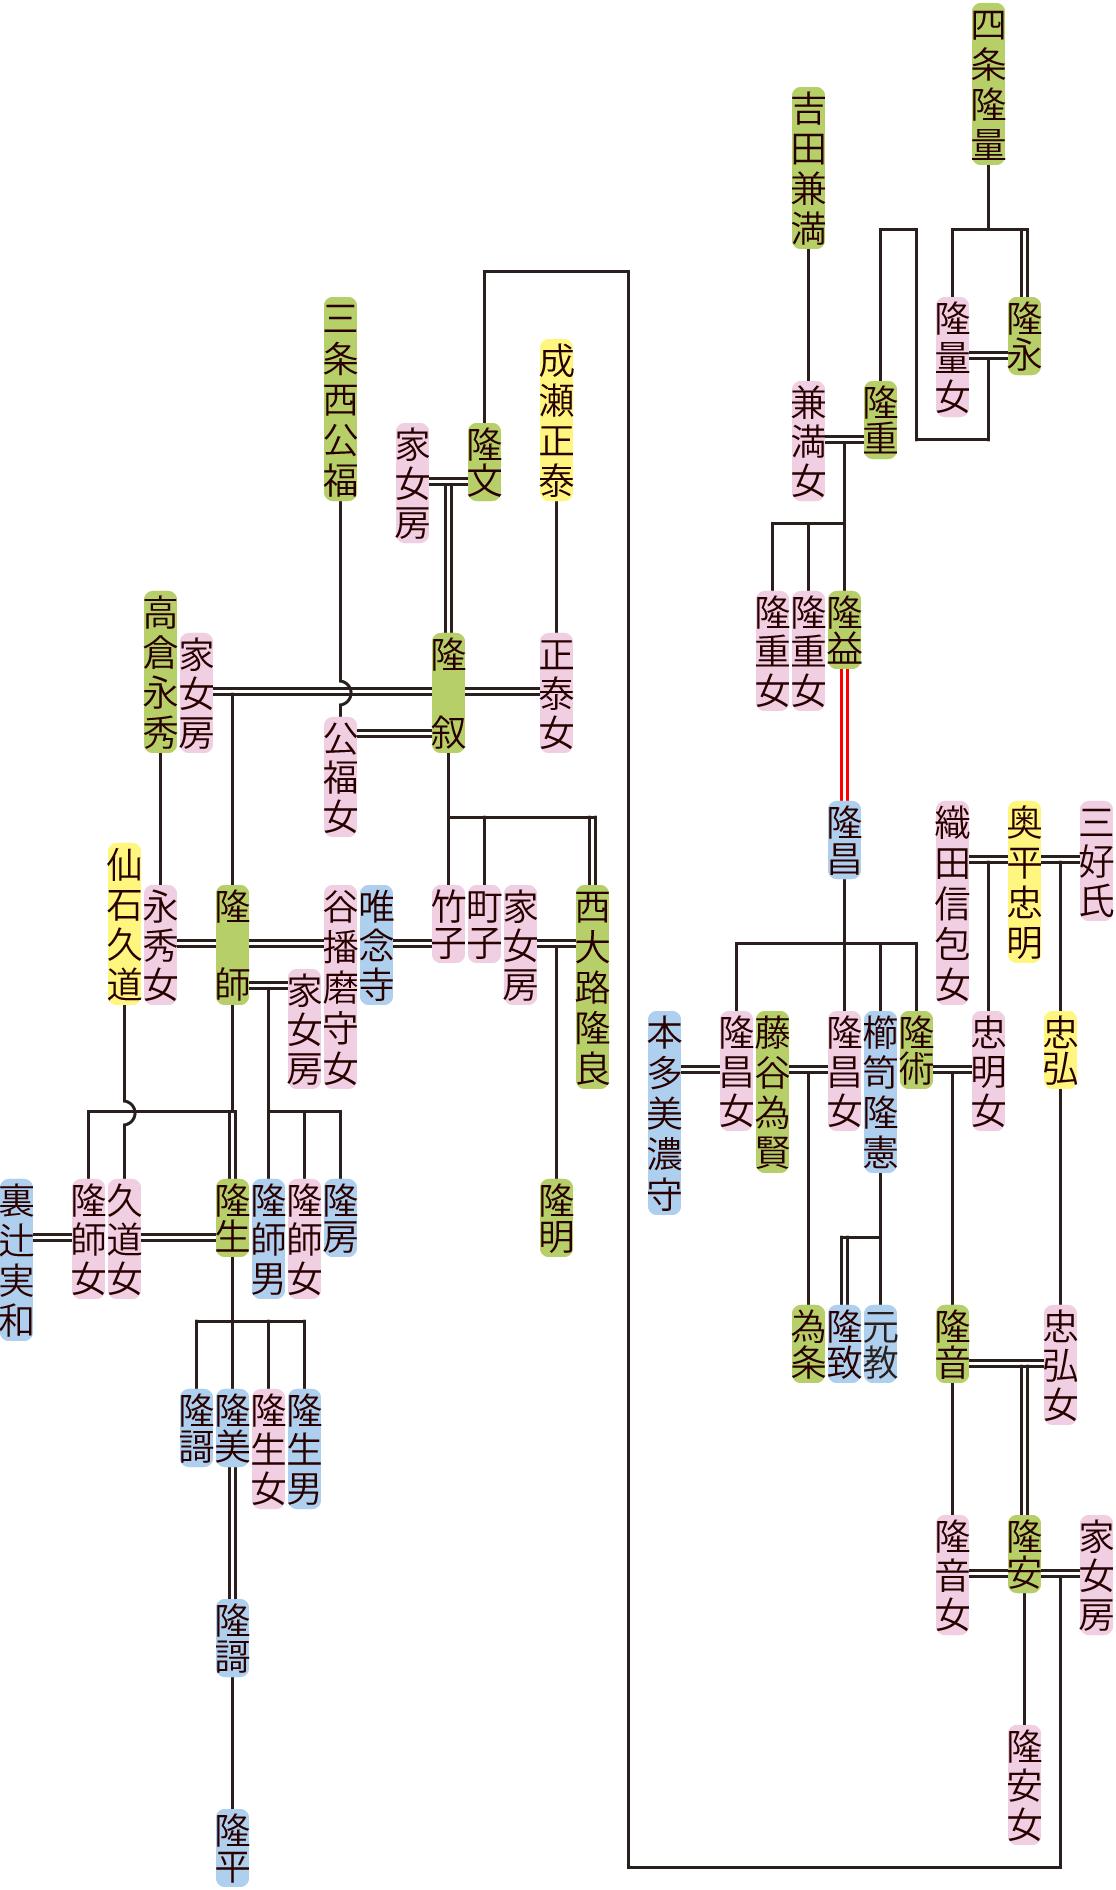 四条隆重~隆平の系図